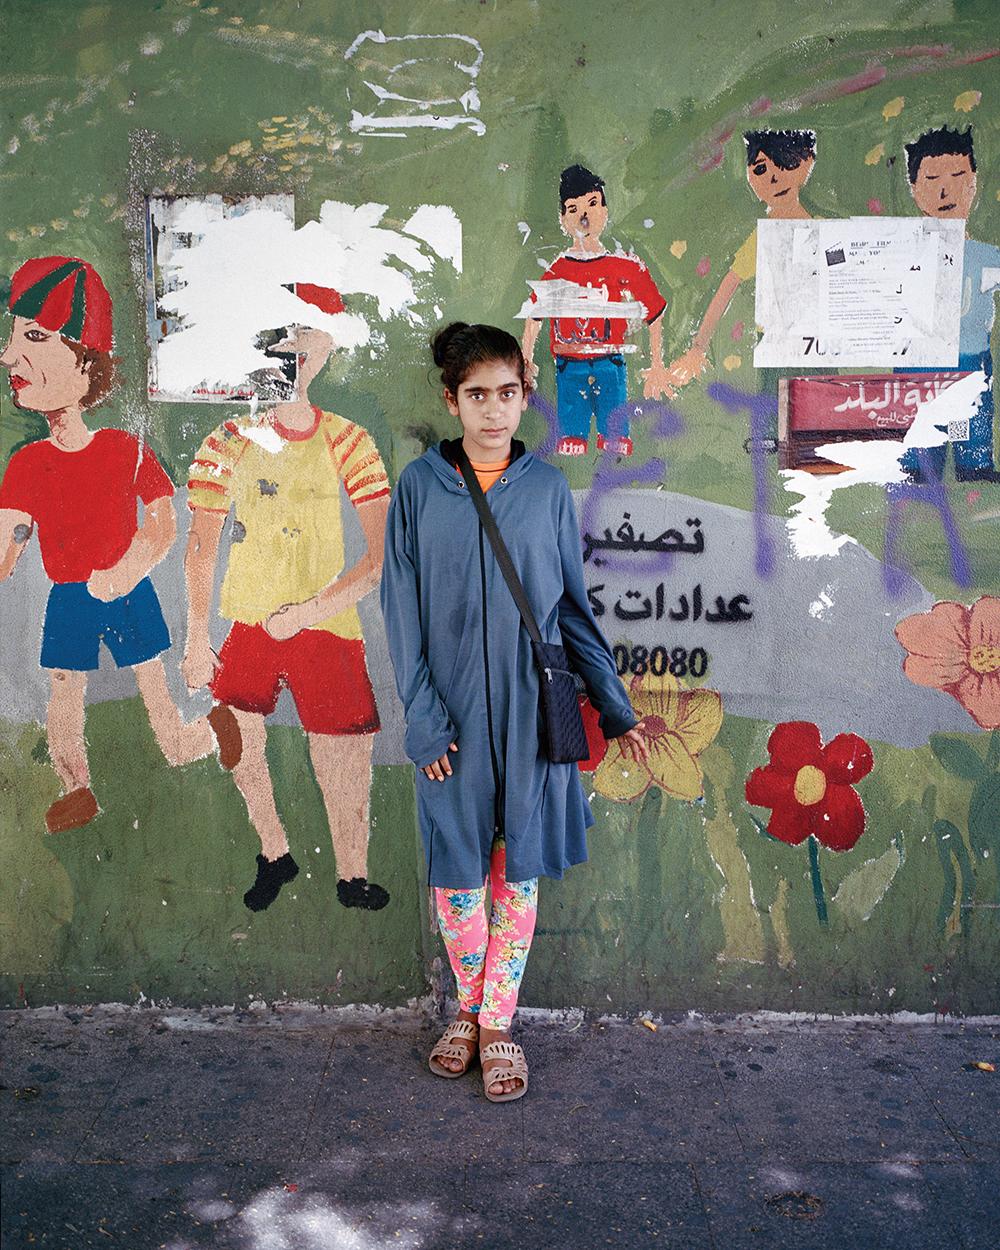 RANIA MATAR, Baddoura 13, Beirut, 2015